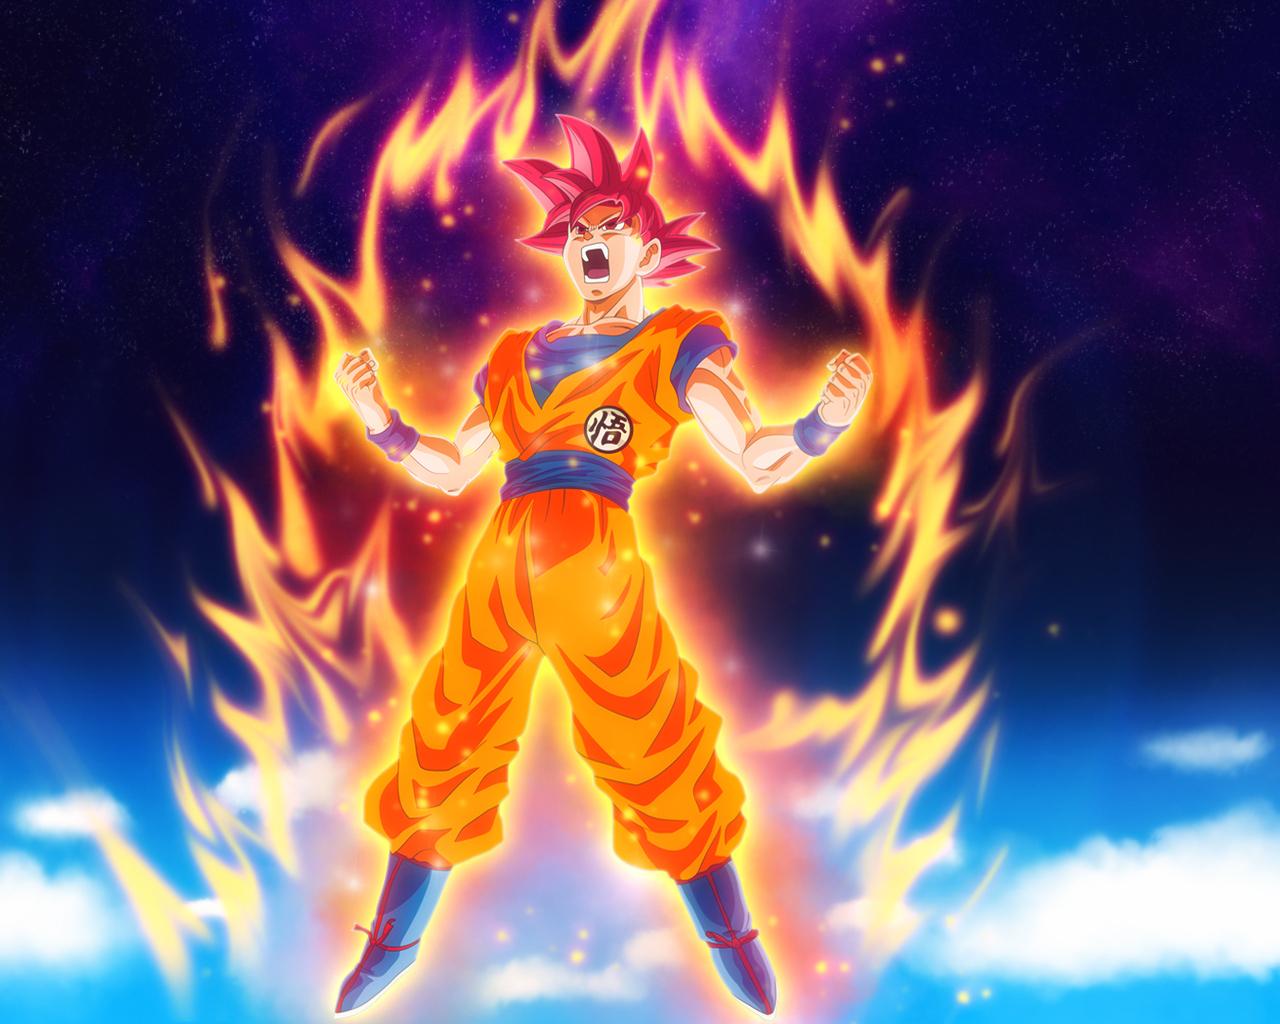 1280x1024 Goku Dragon Ball Super Anime Hd 1280x1024 Resolution Hd